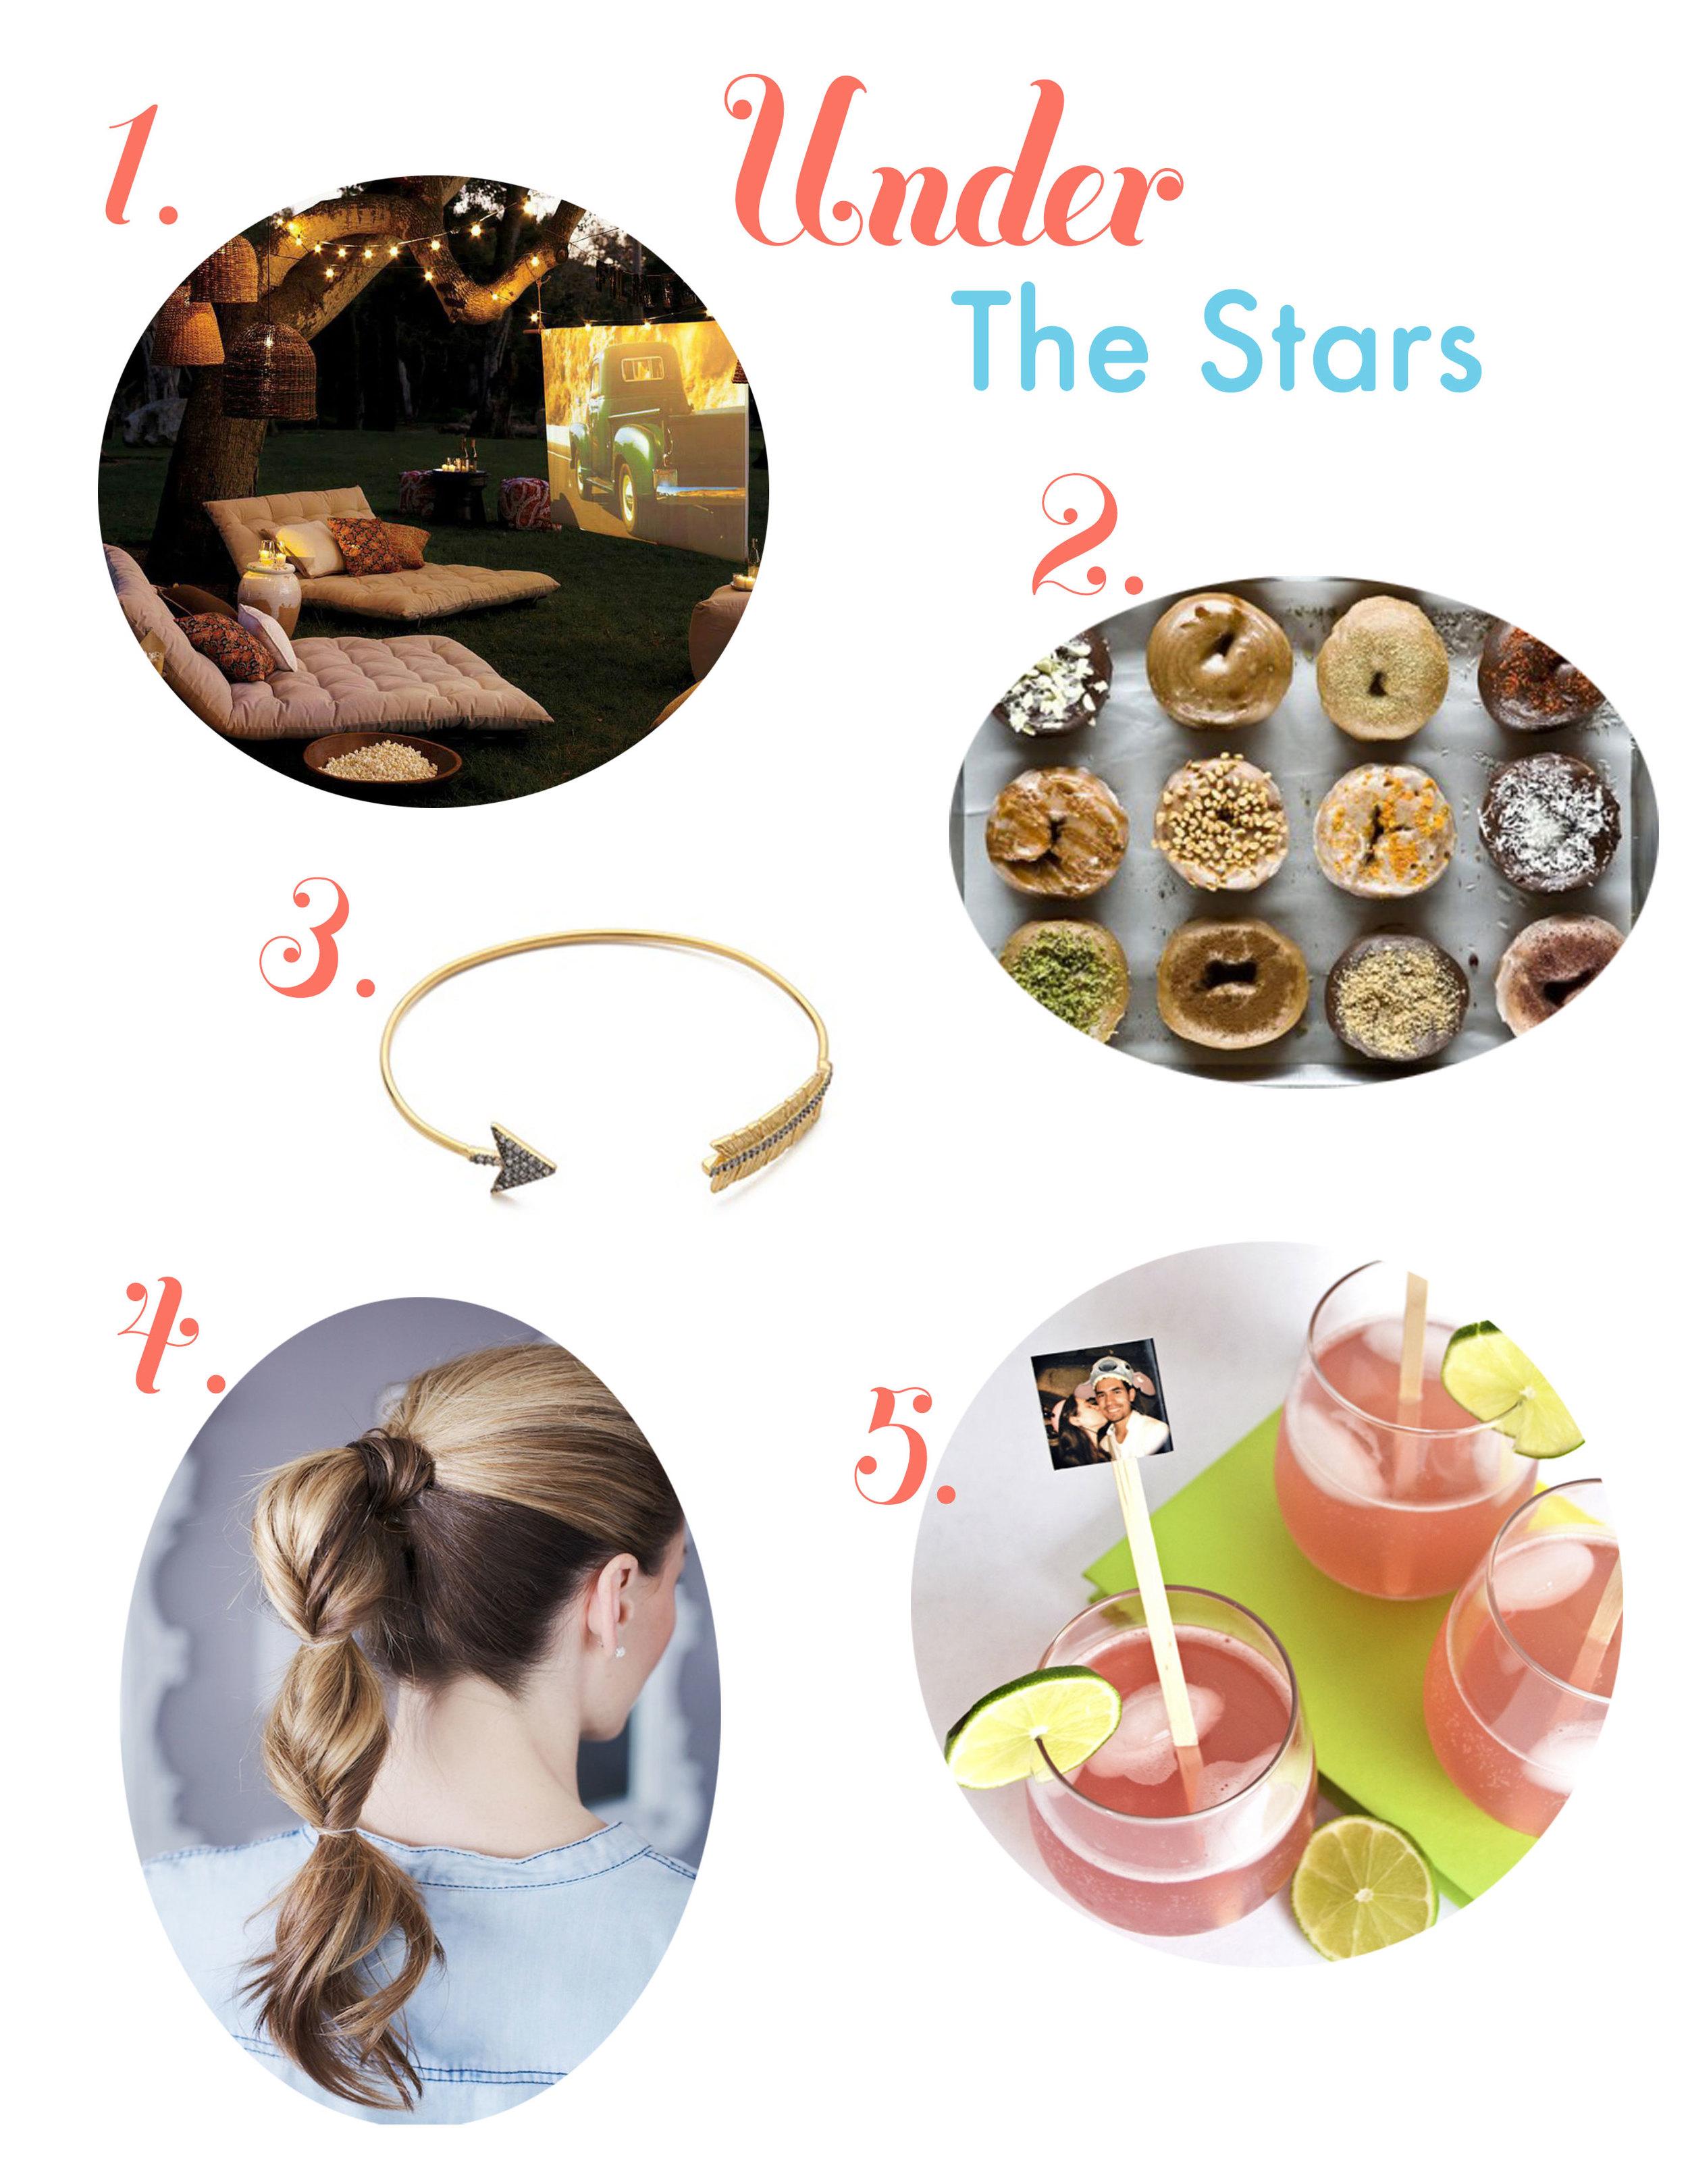 Philadelphia movies, federal donuts, arrow bracelet, DIY drink stir